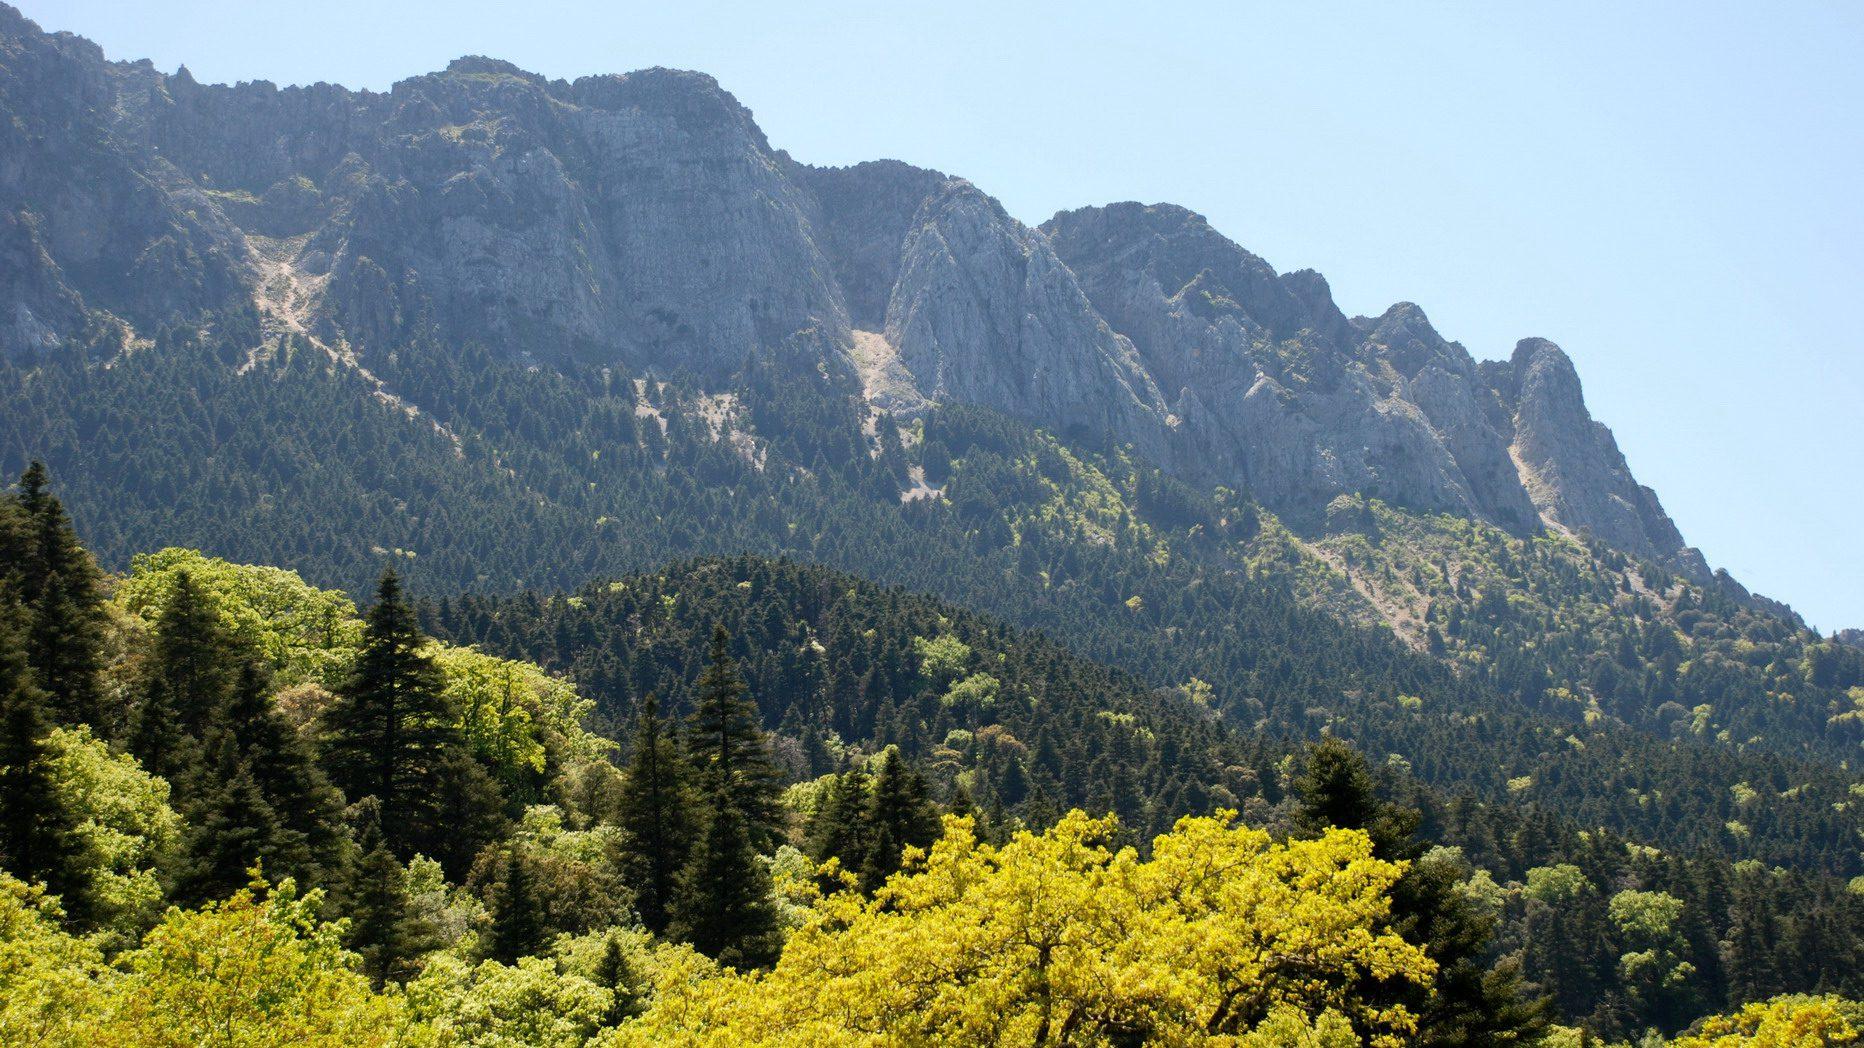 Senderismo en el Pinsapar. Parque Natural de Grazalema. Andalucia